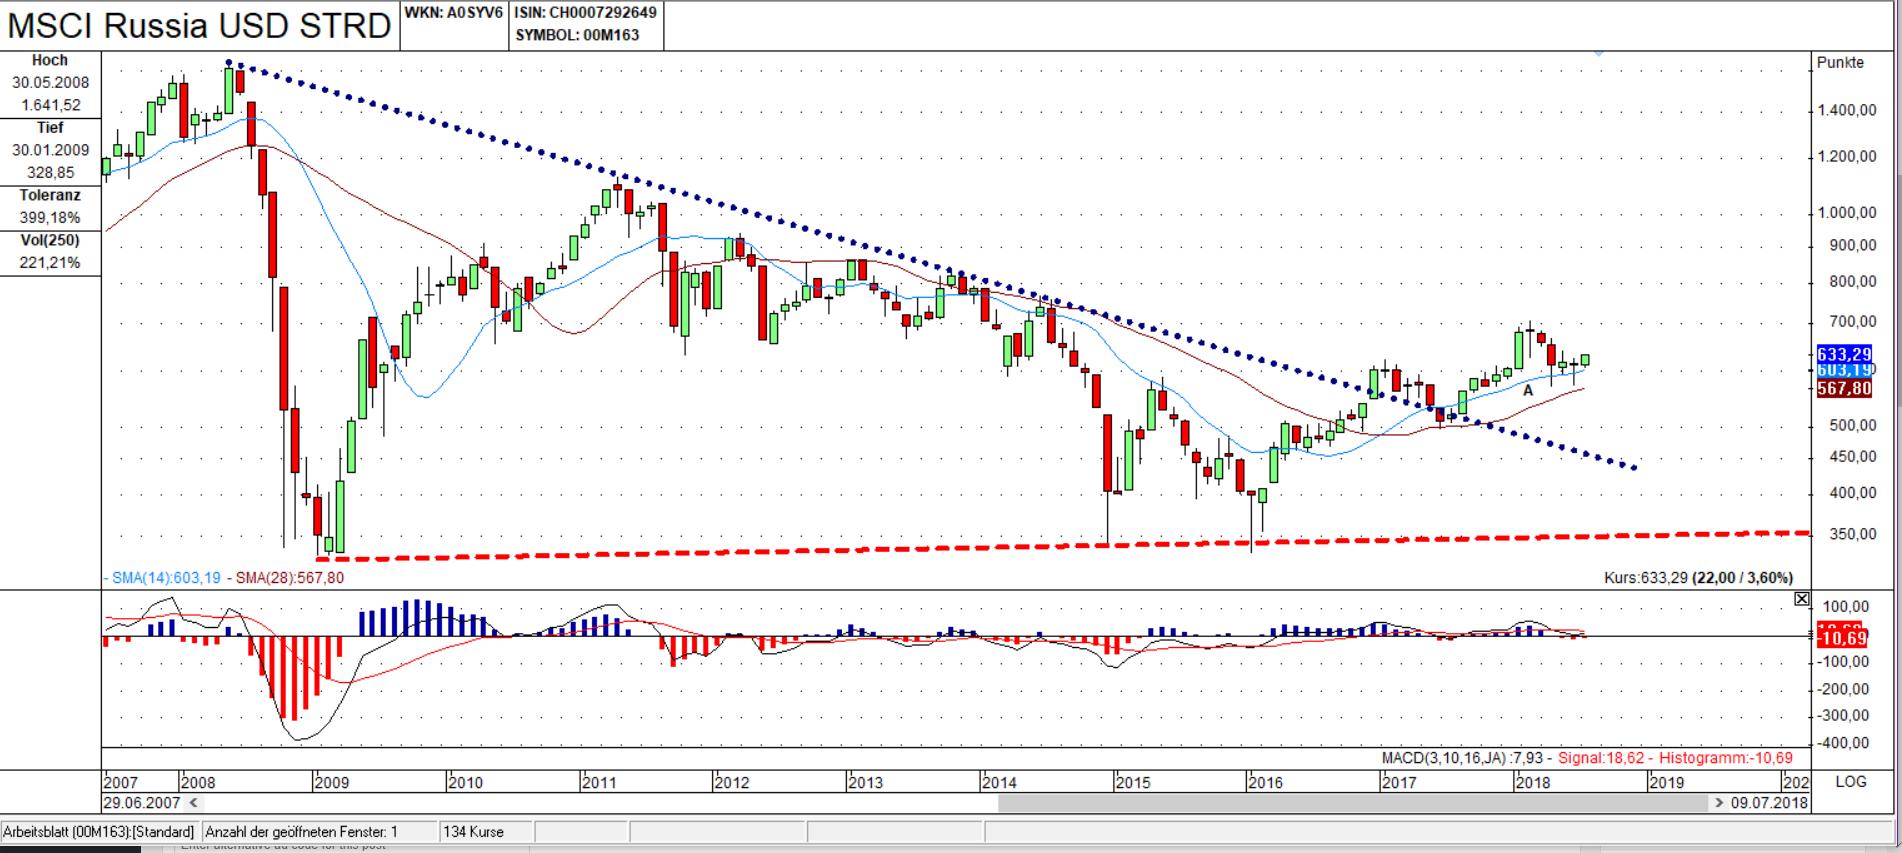 MSCI Russia USD STRD Chart: Value Zone meets Umkehrstab